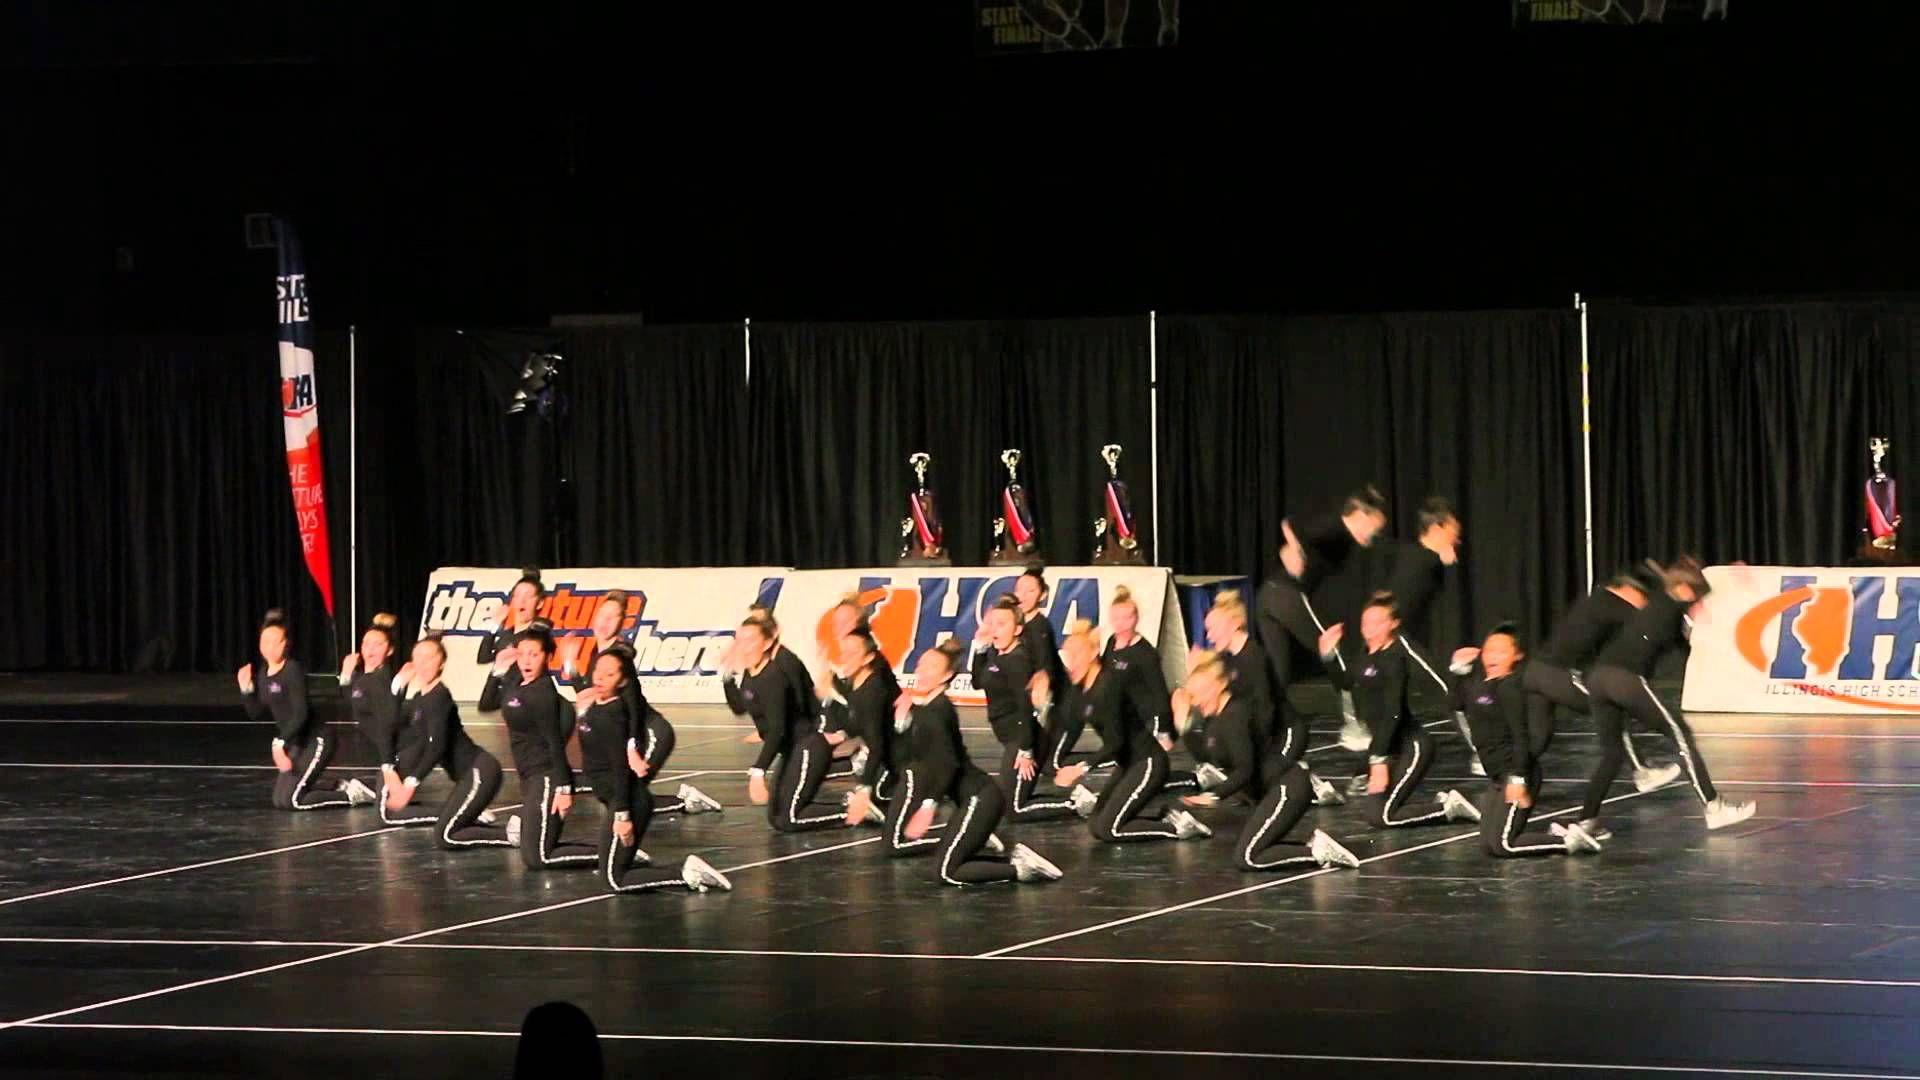 Pin By Kari Williams On 5 6 7 8 Dance Teams Performance Dance